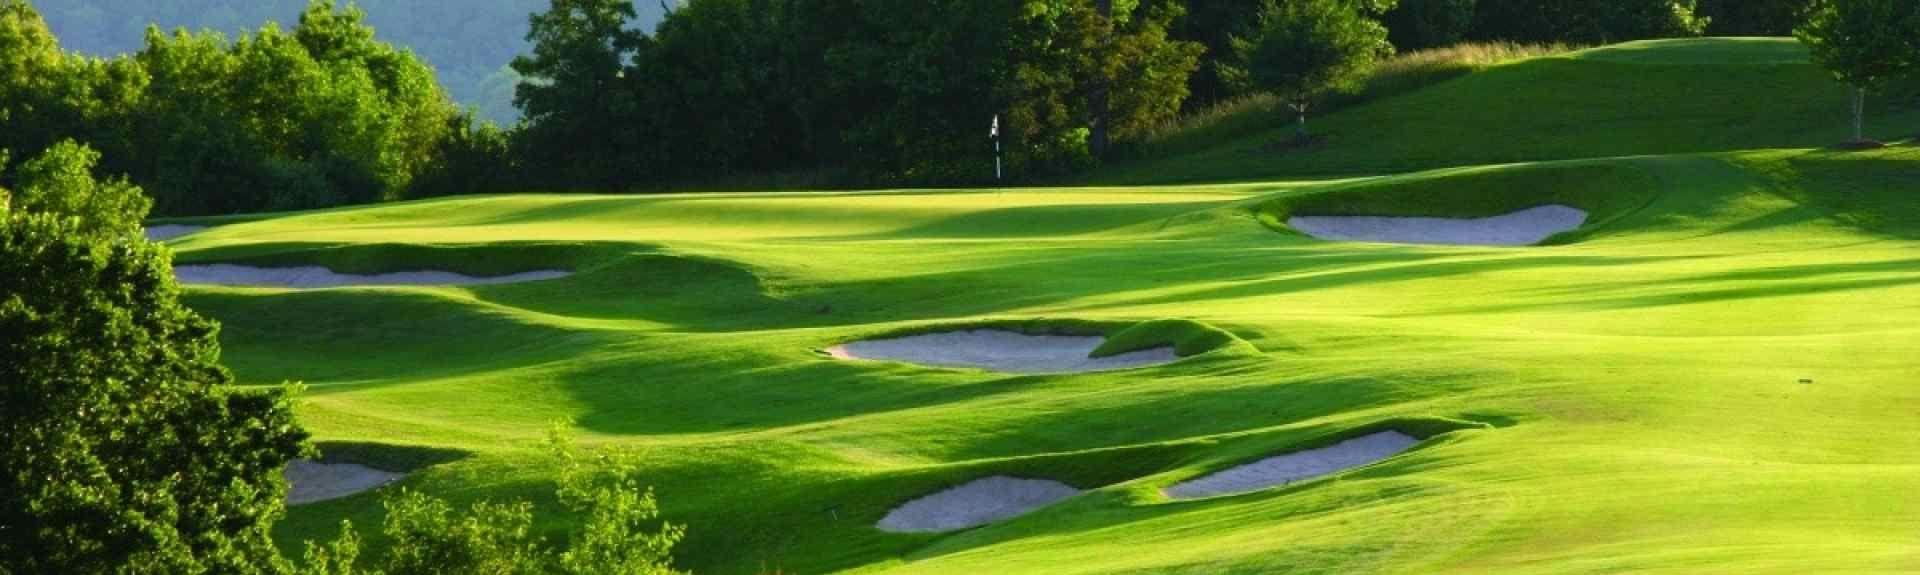 Thousand Island Golf Resort, Branson, MO, USA